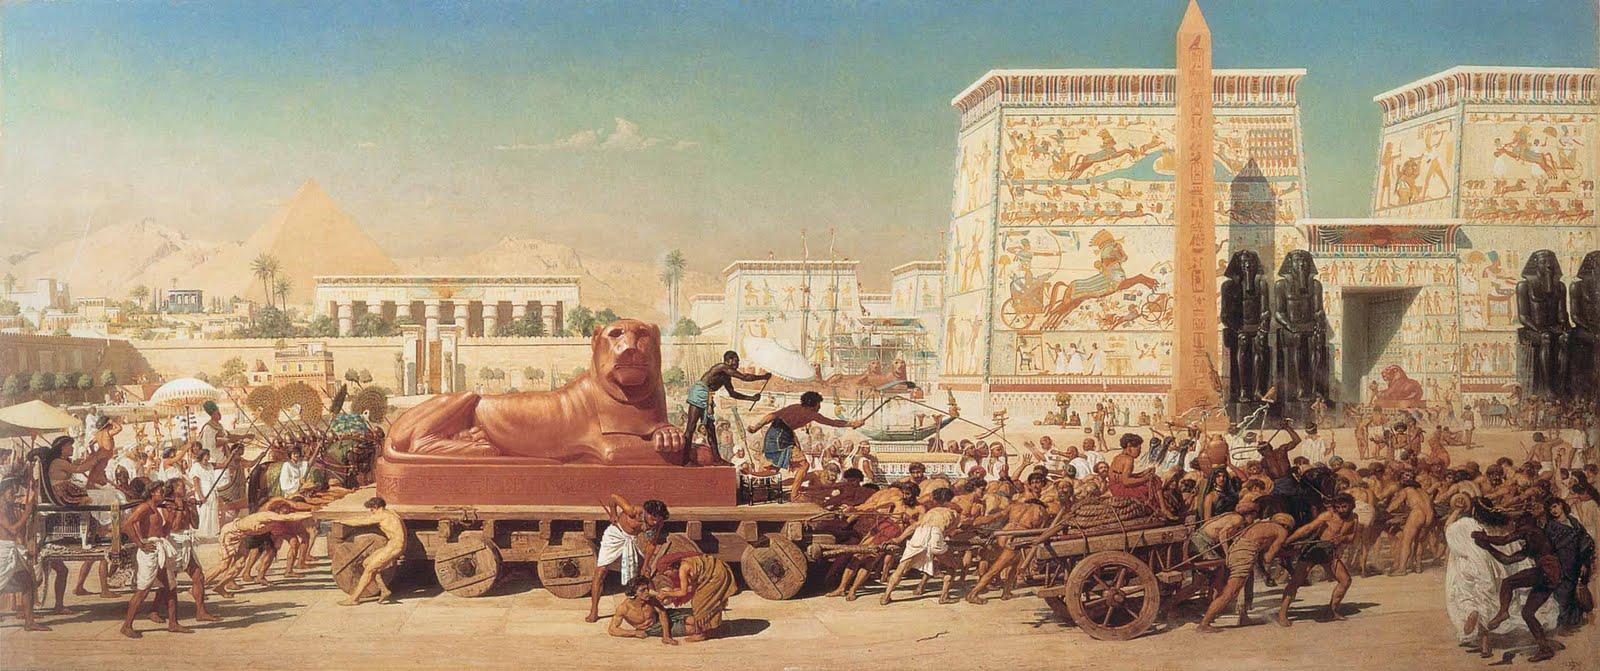 historia antiguo egipto: